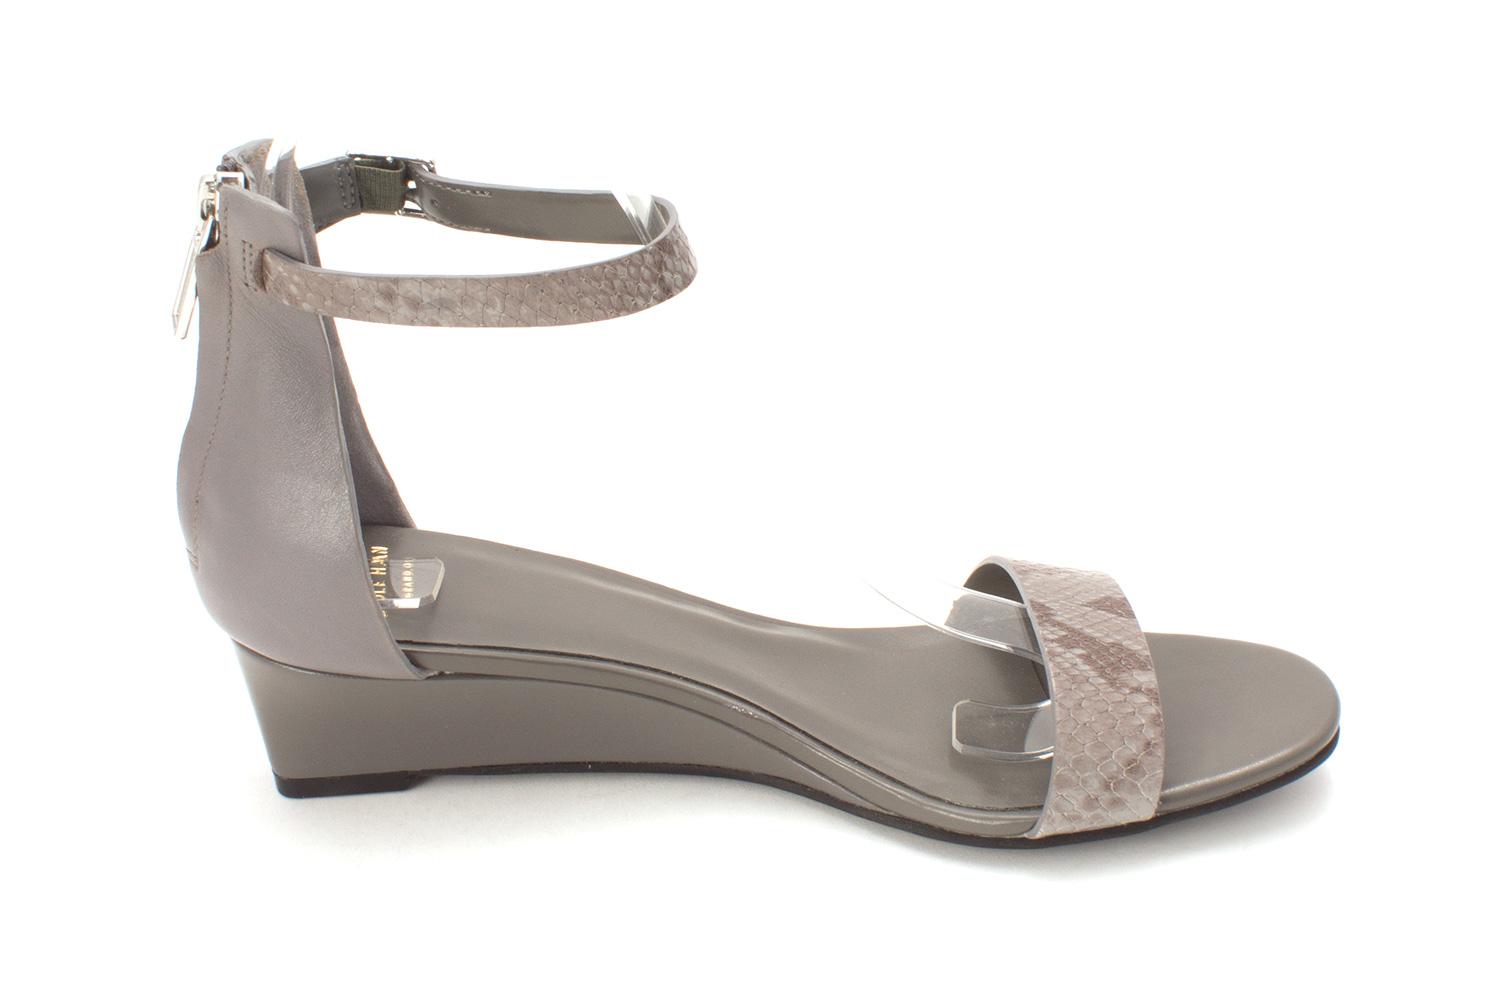 Cole Haan Womens 14A4048 Open Toe Casual Platform Sandals